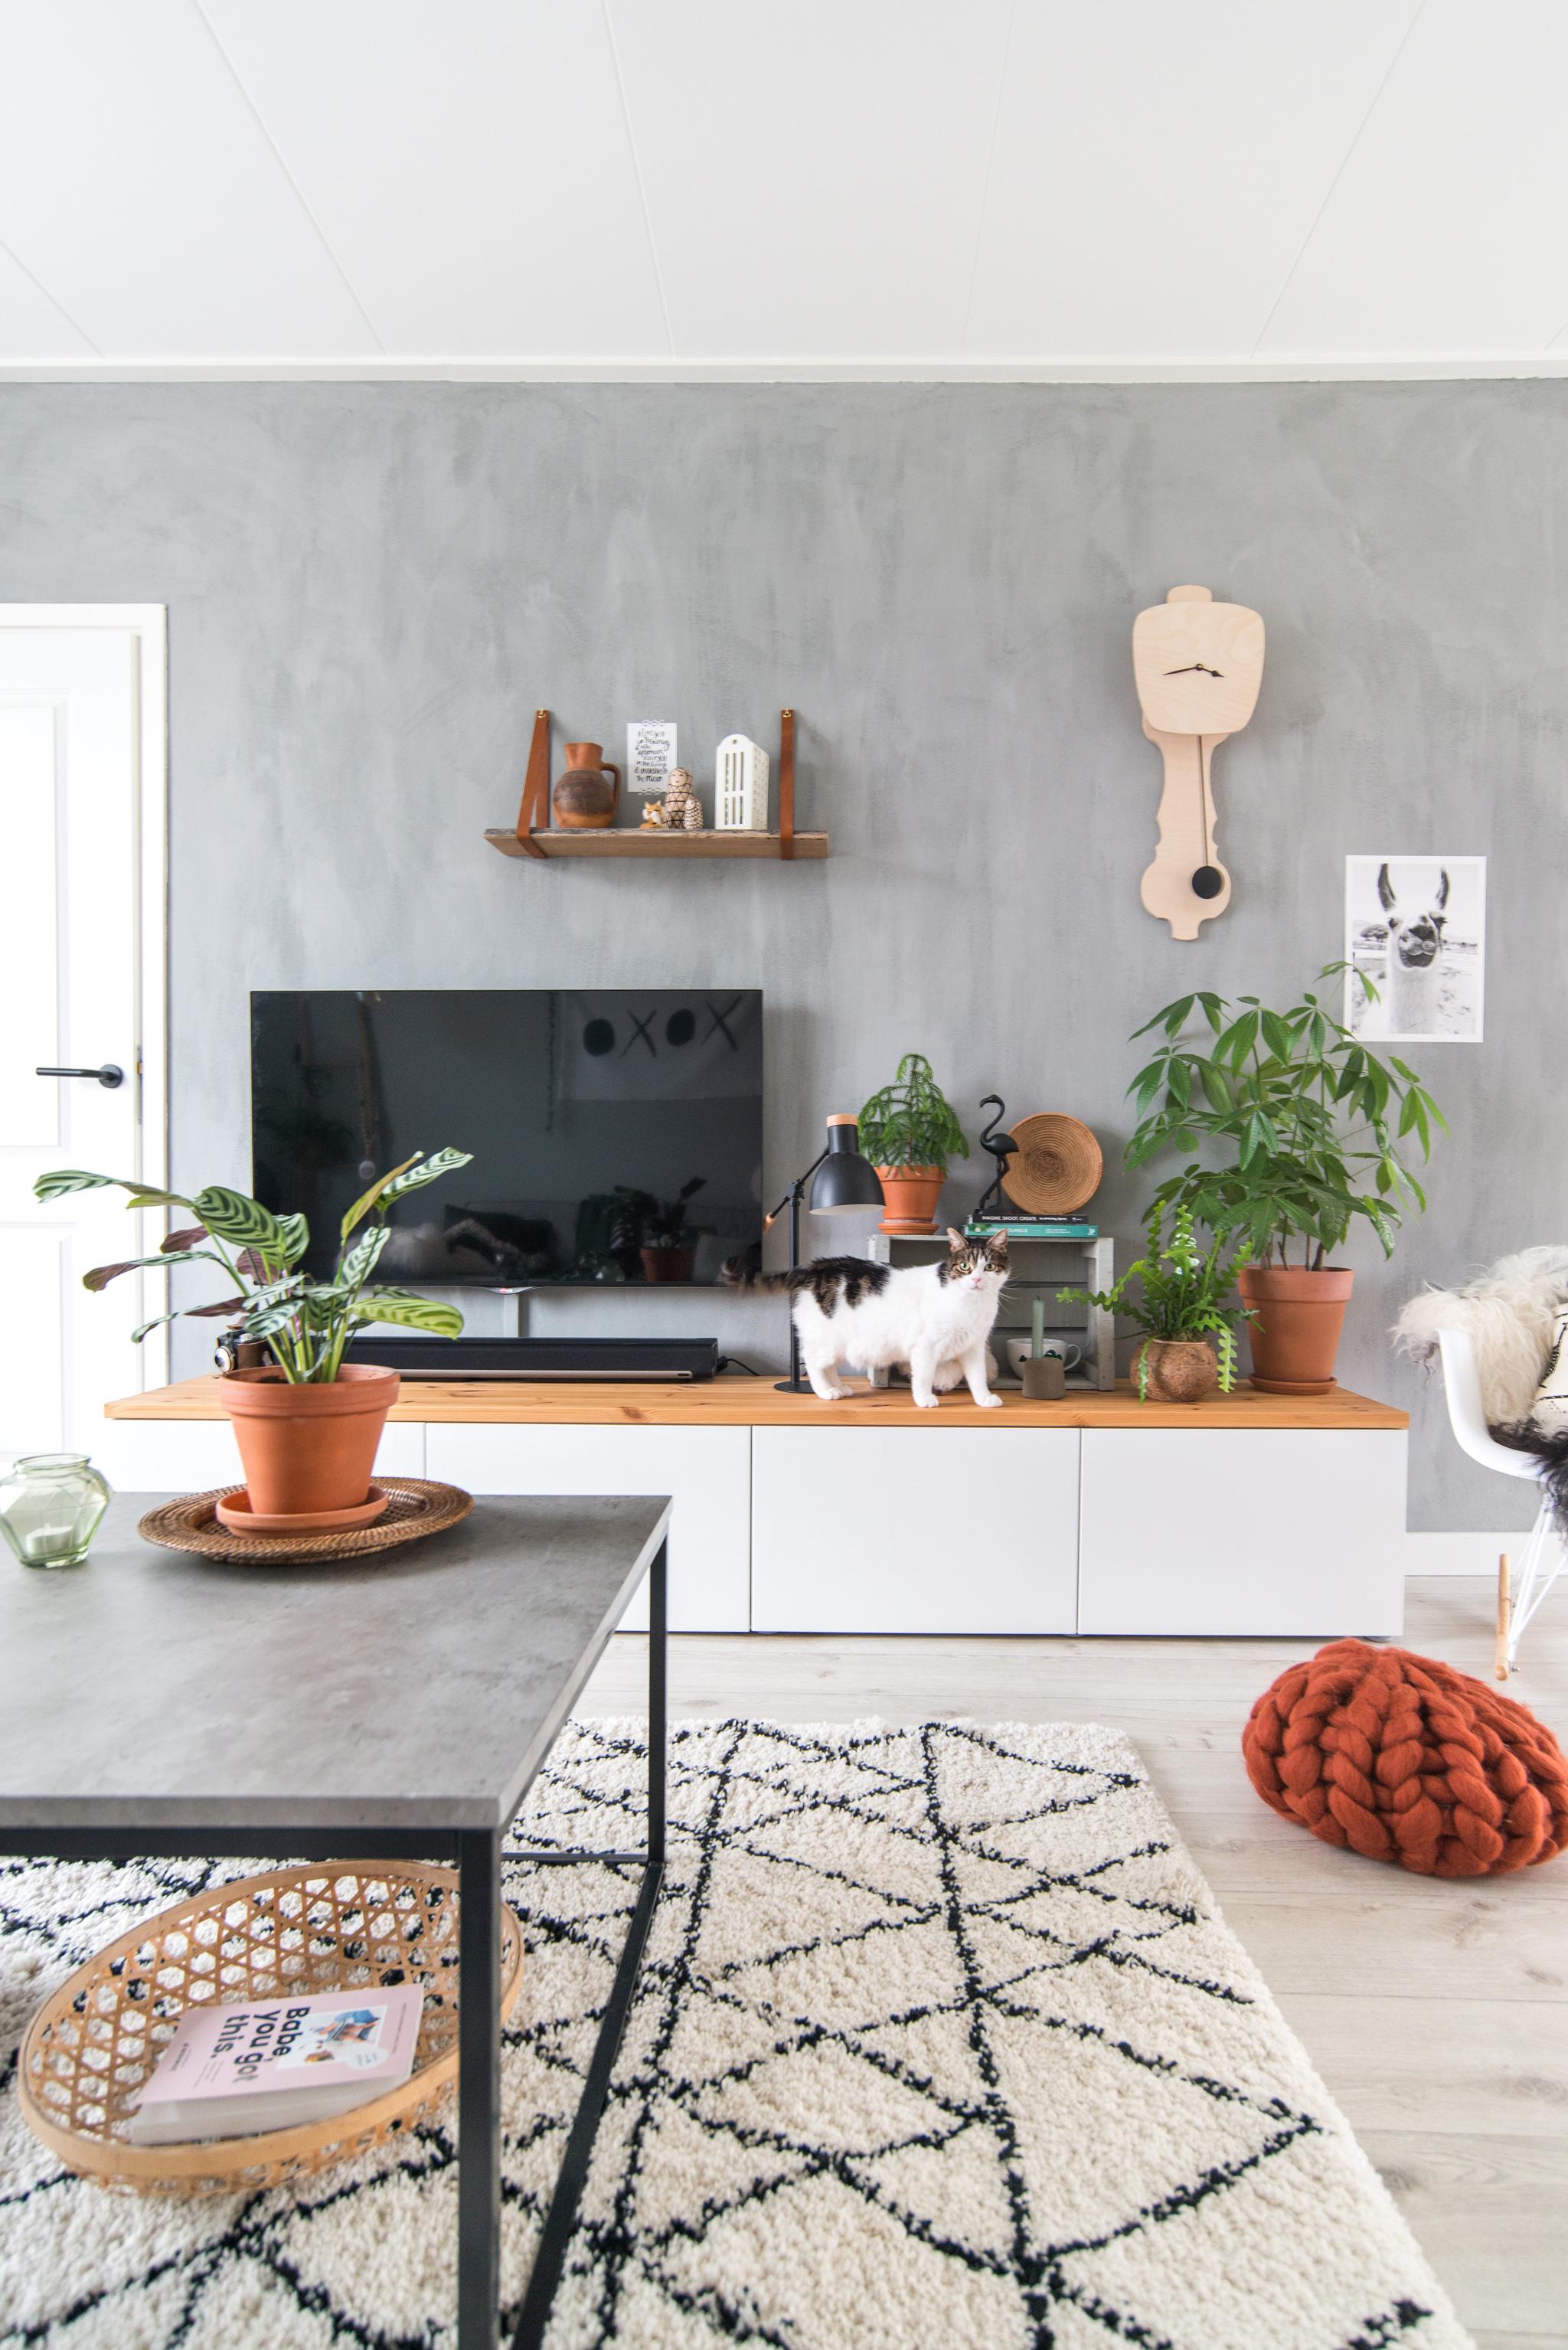 keeelly91blog wonen pureandoriginal greywall interieur planten catlover plantlover woonkamer ikea besta tvmeubel industrial jysk